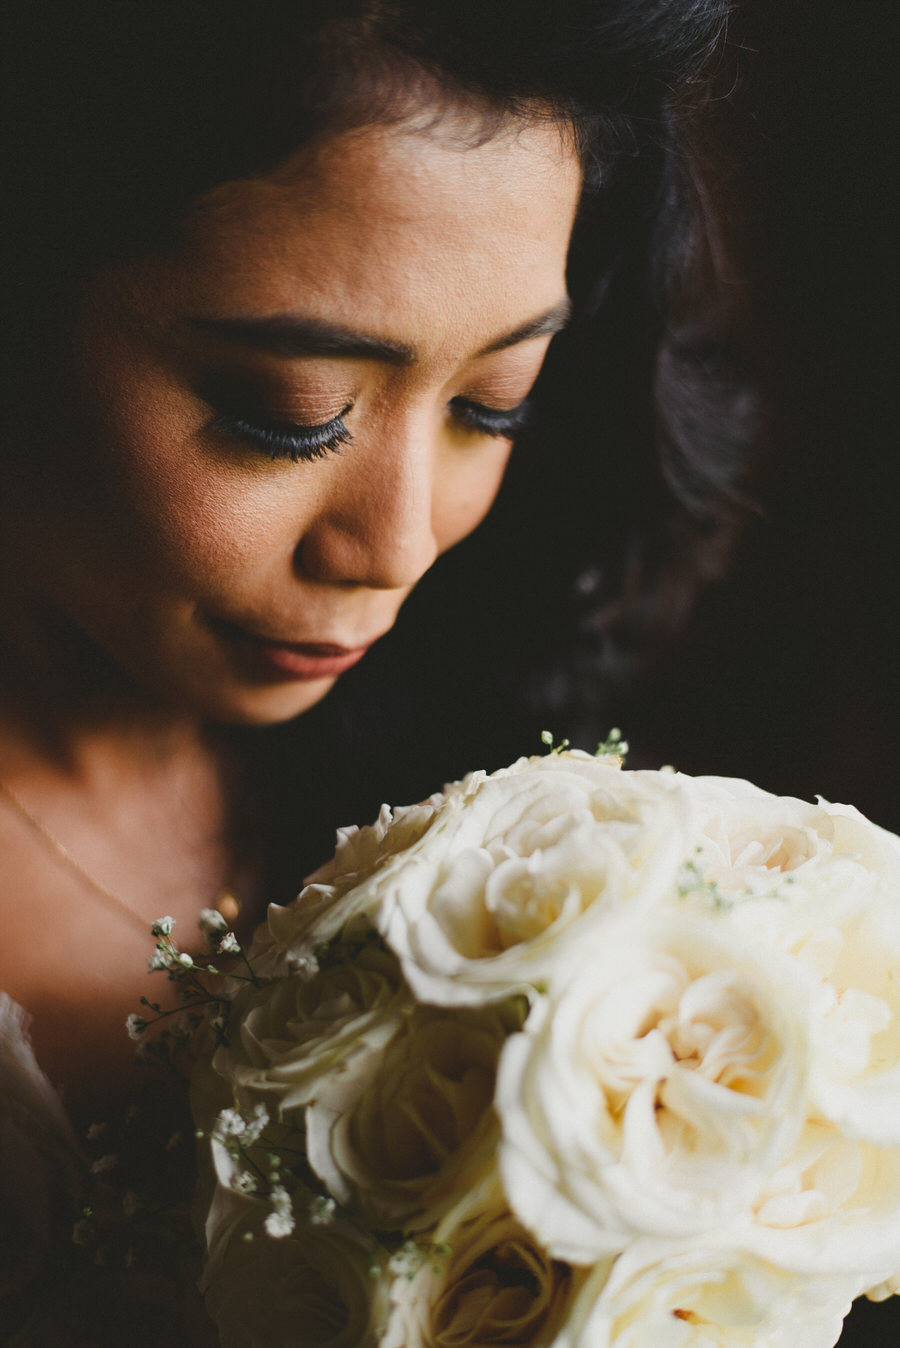 bali wedding destination-wedding in bali - bali photographer - pantai lima estate - profesional bali wedding photographer - diktatphotography - ade + sam - 23